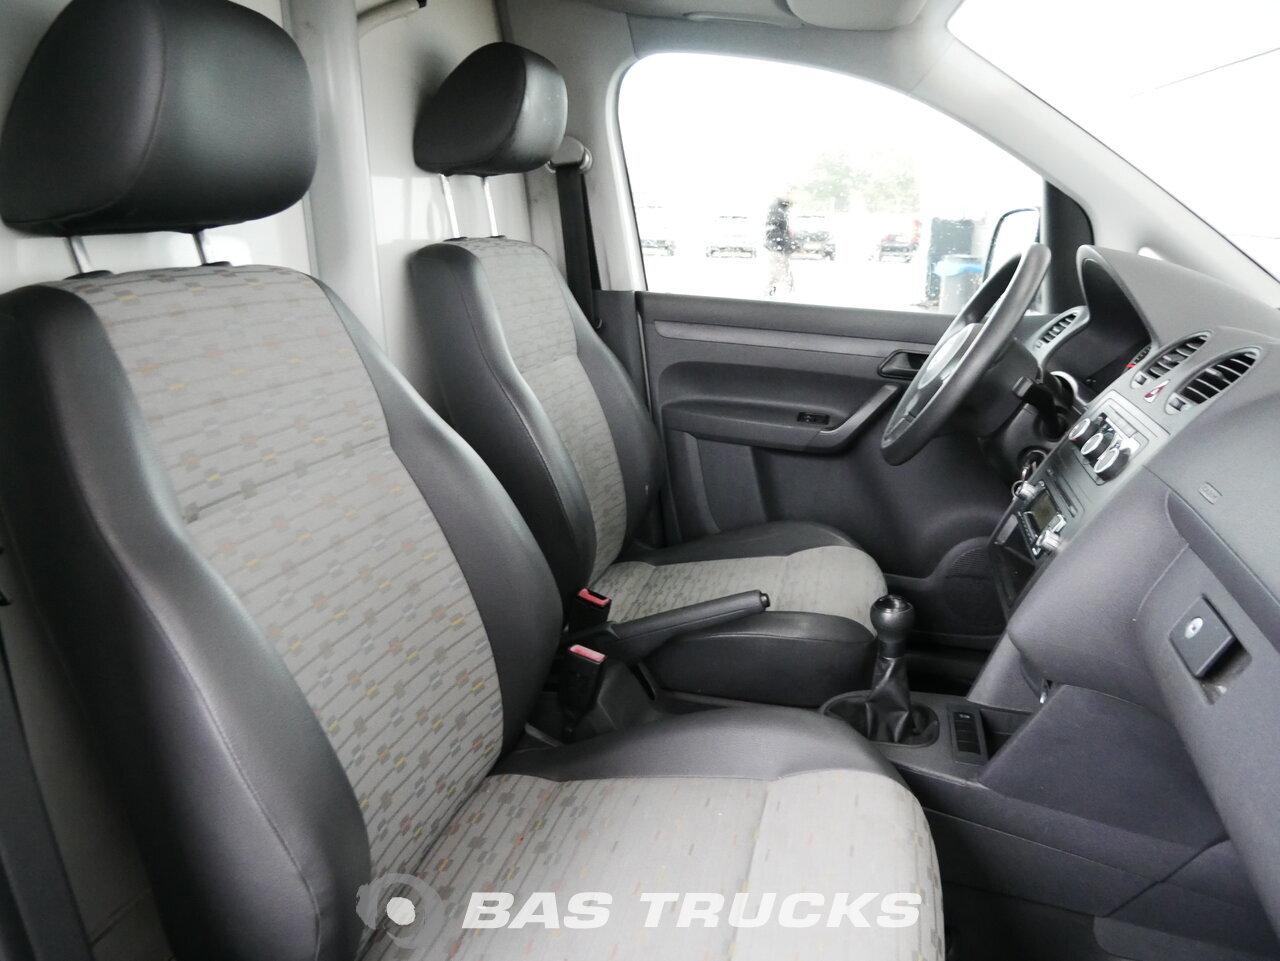 foto de Usado Furgoneta liviana Volkswagen Caddy 2011